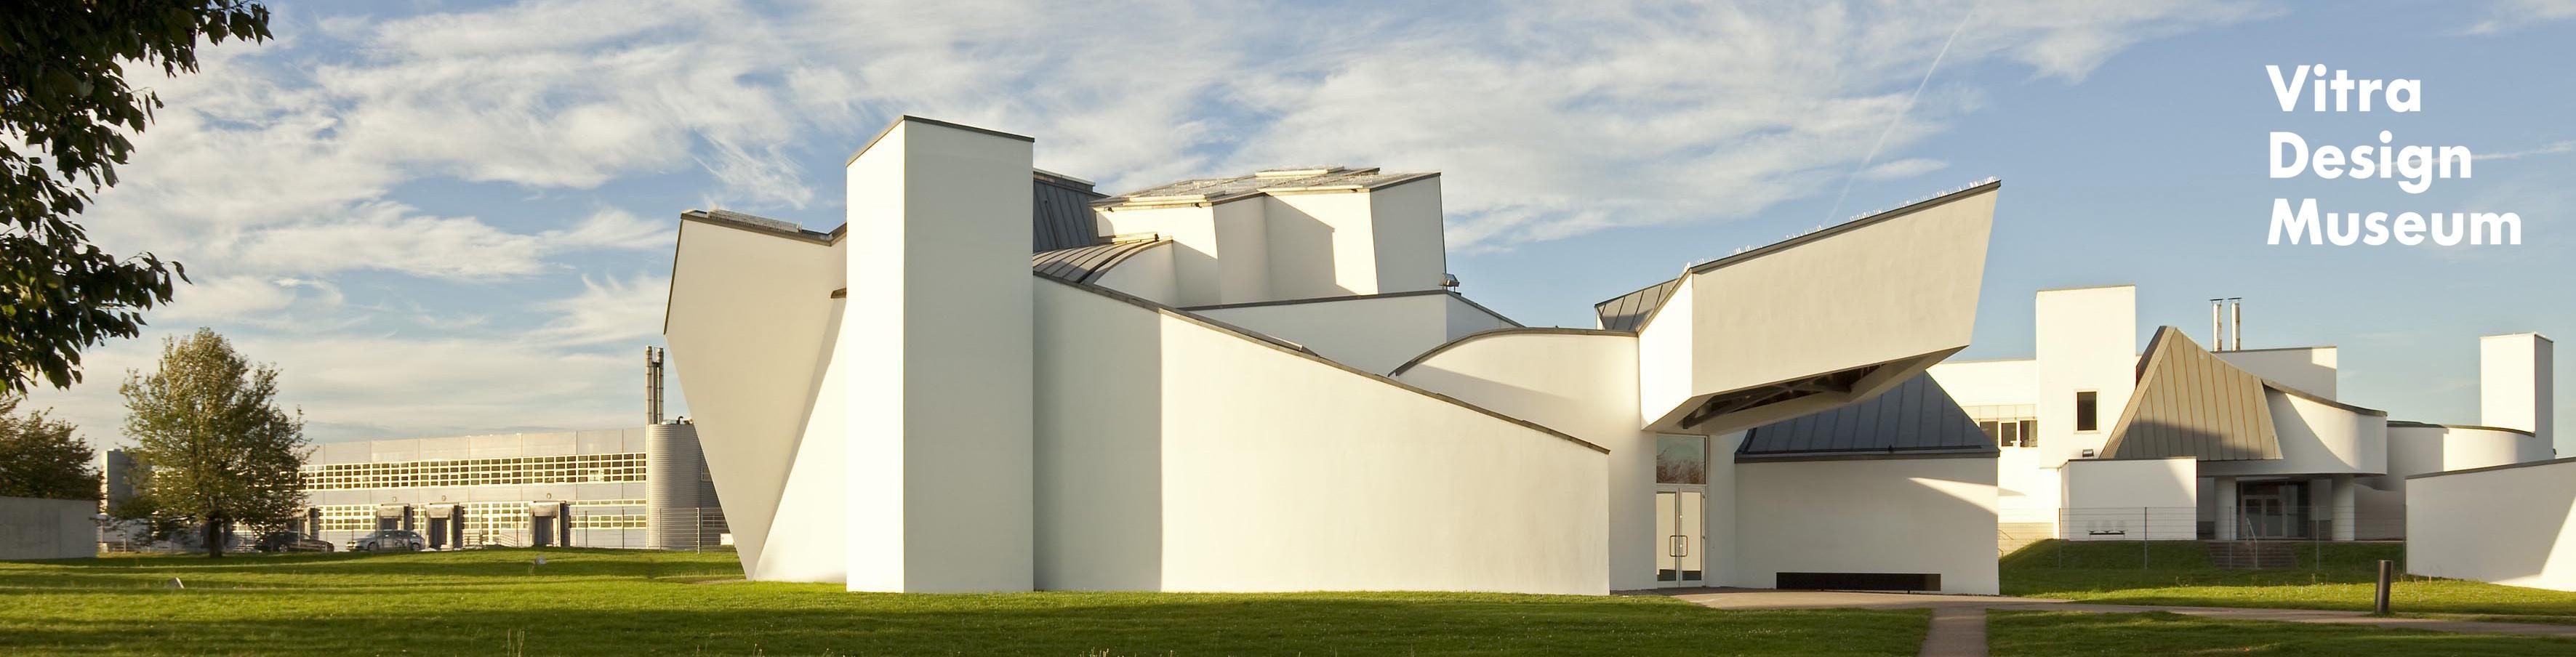 Vitra Design Museum.Vitra Design Museum Linkedin